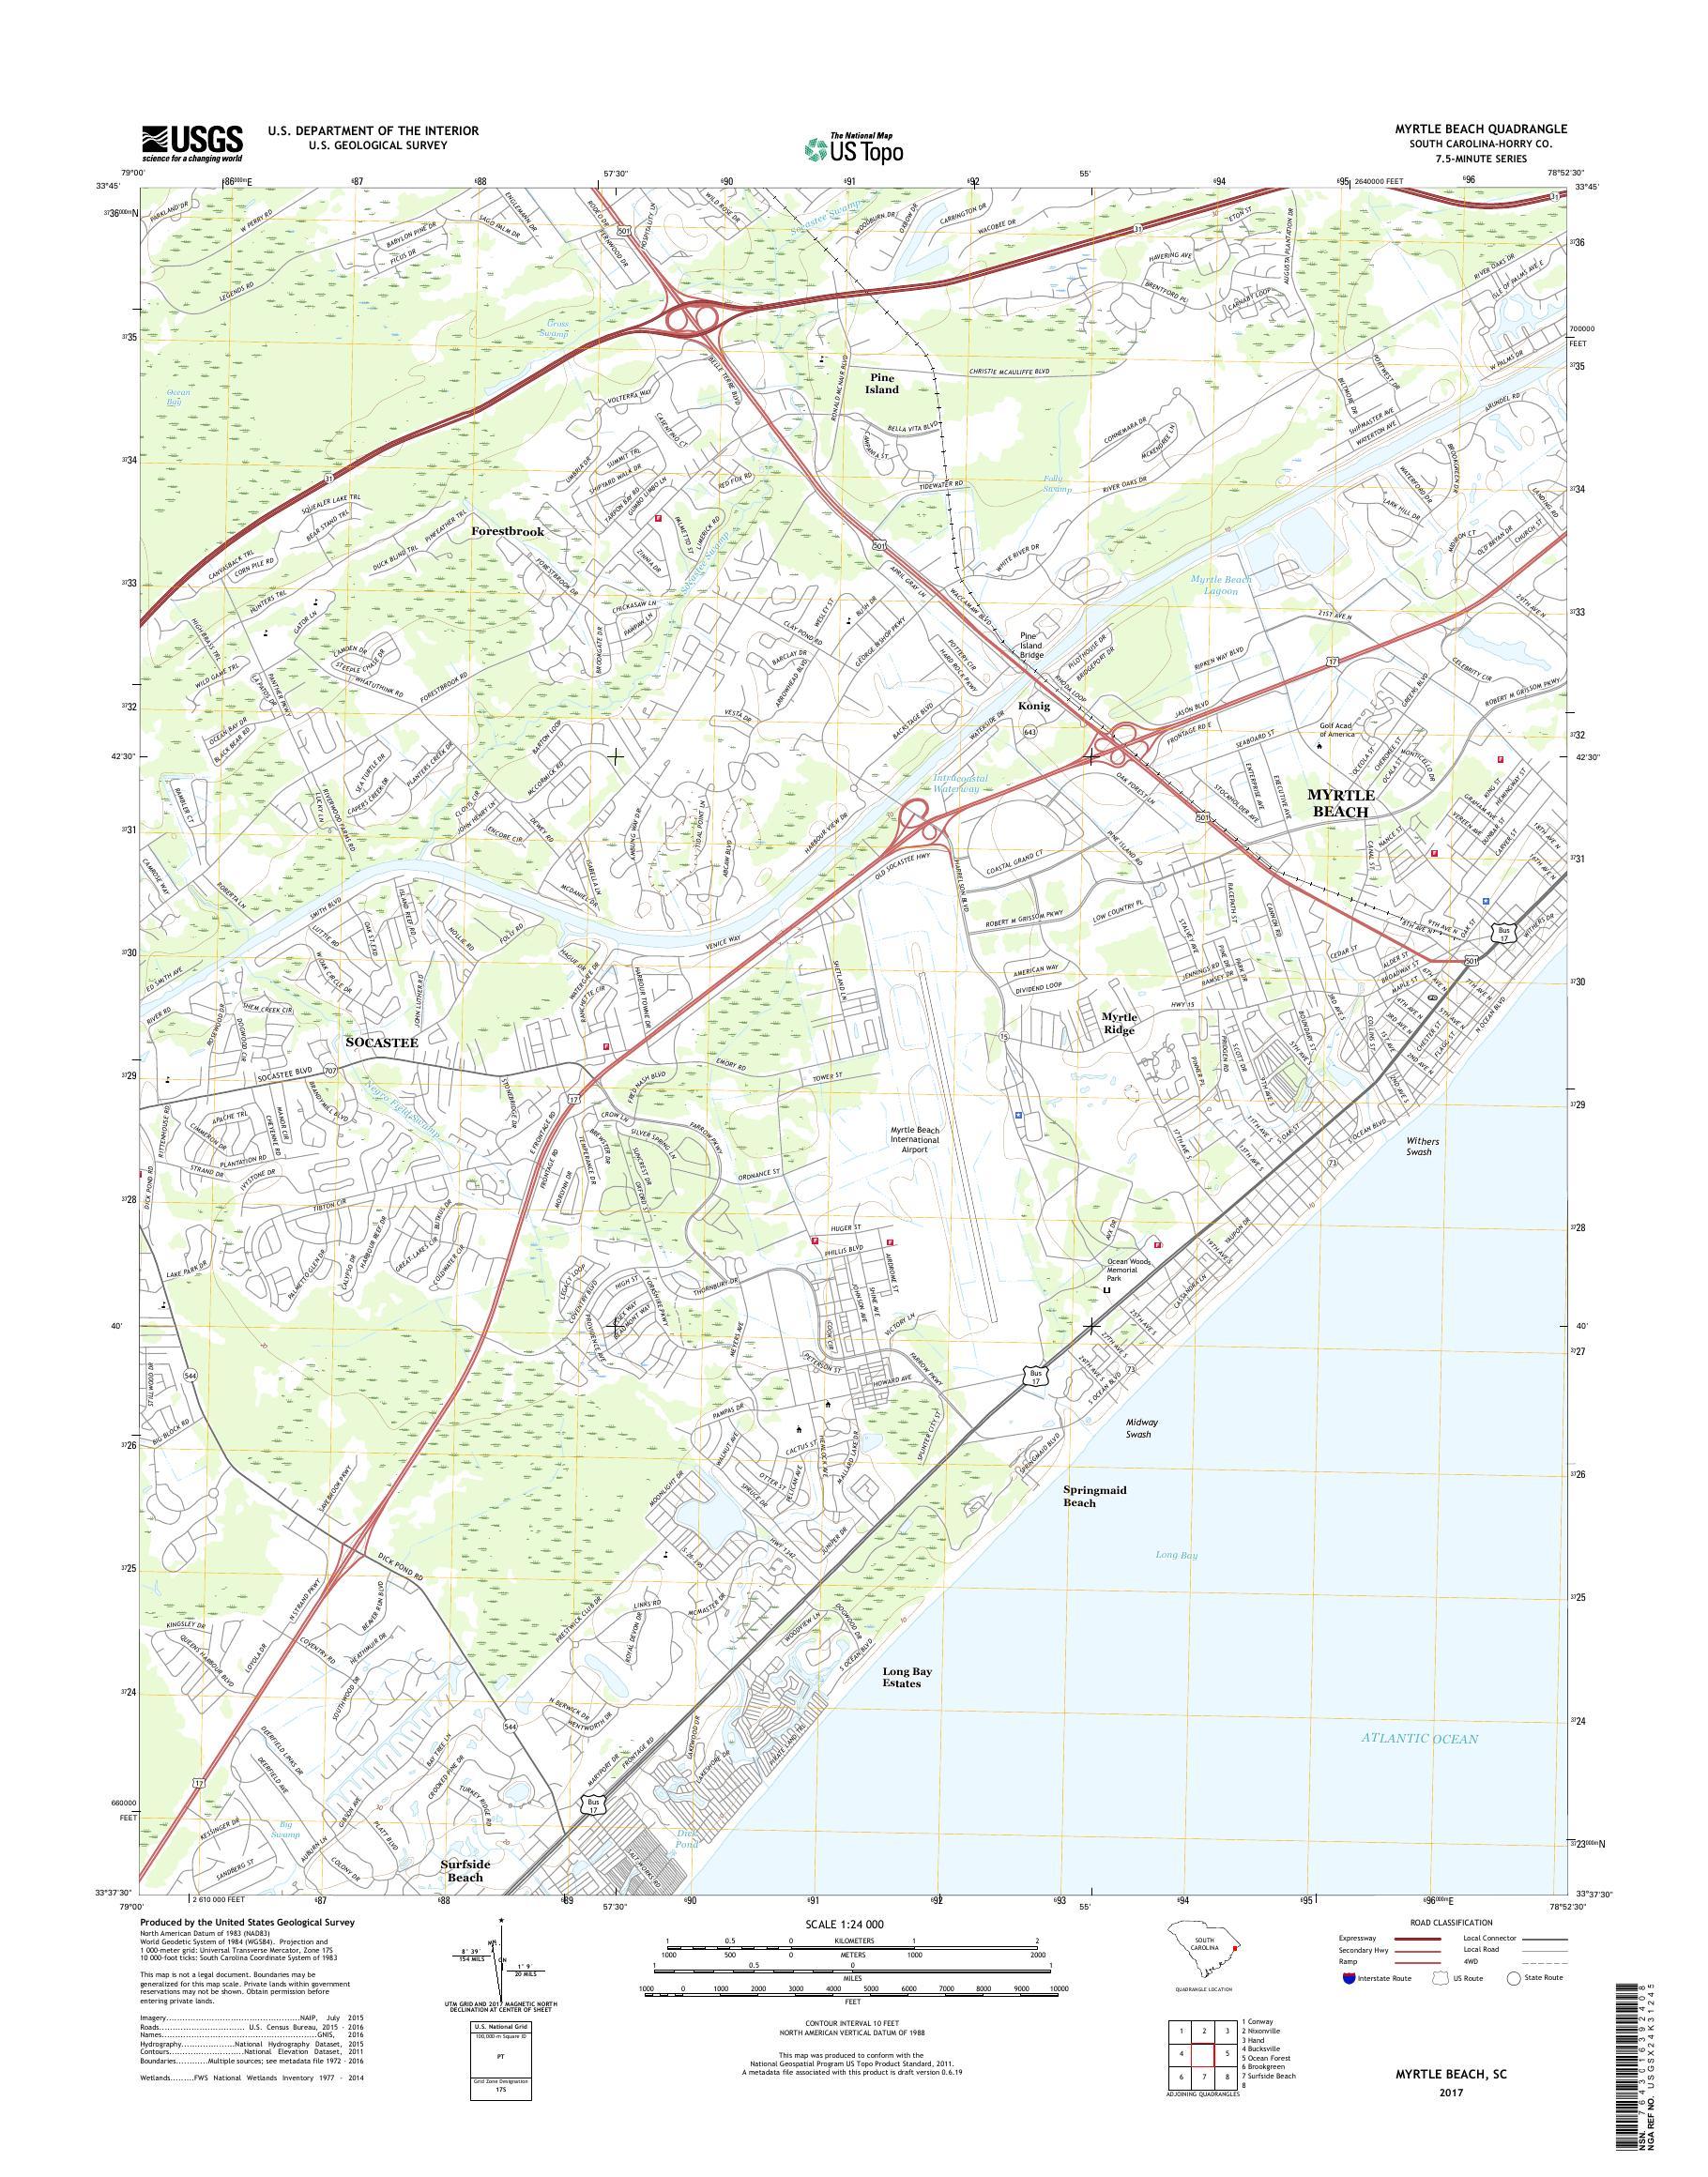 MyTopo Myrtle Beach, South Carolina USGS Quad Topo Map on